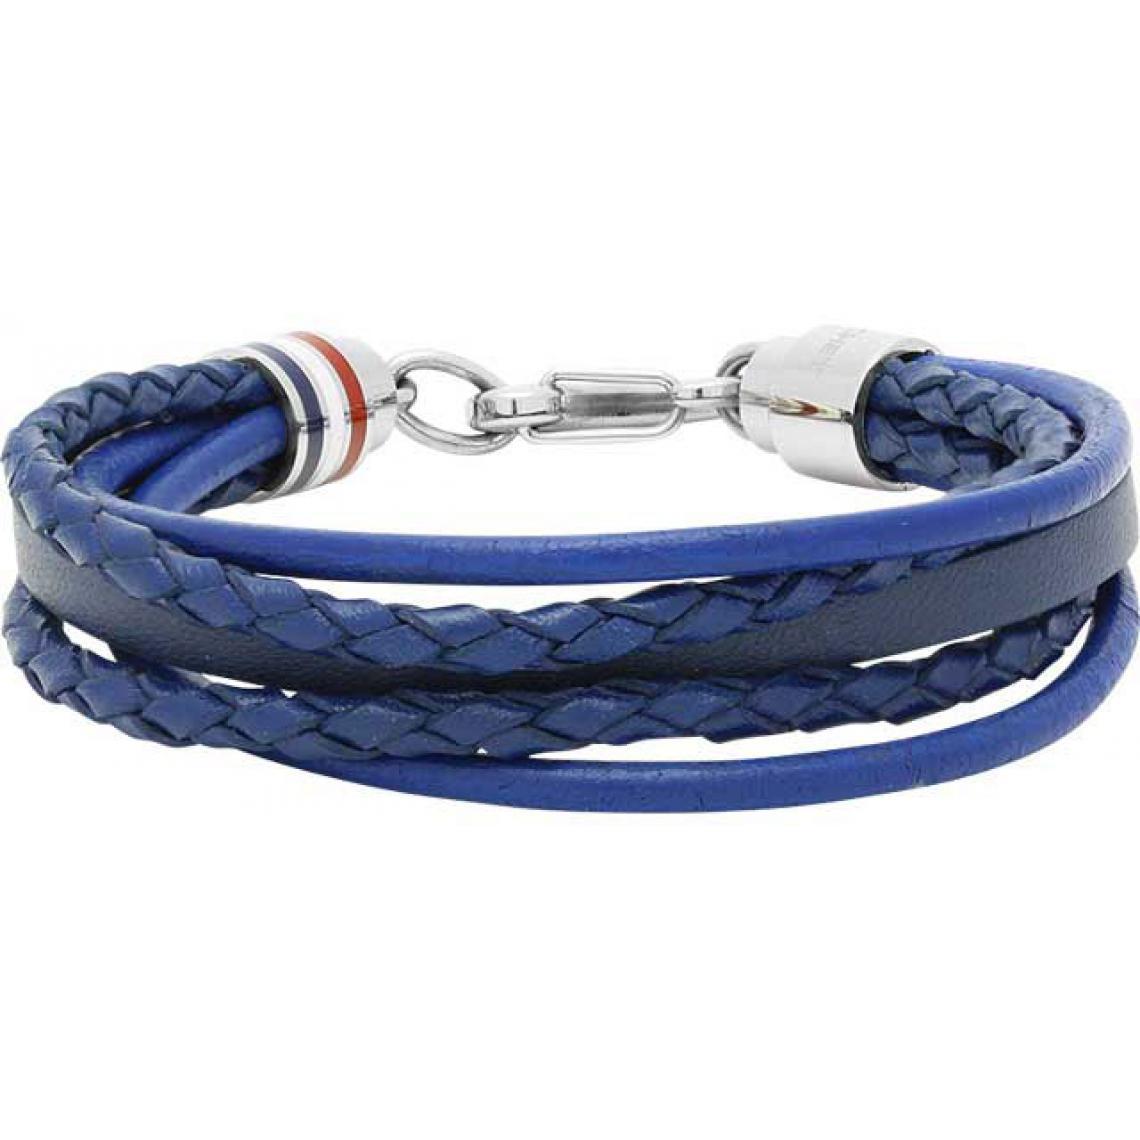 Promo : Bracelet Rochet Flibustier B361360 - Bracelet Multitour Bleu Cuir Rochet